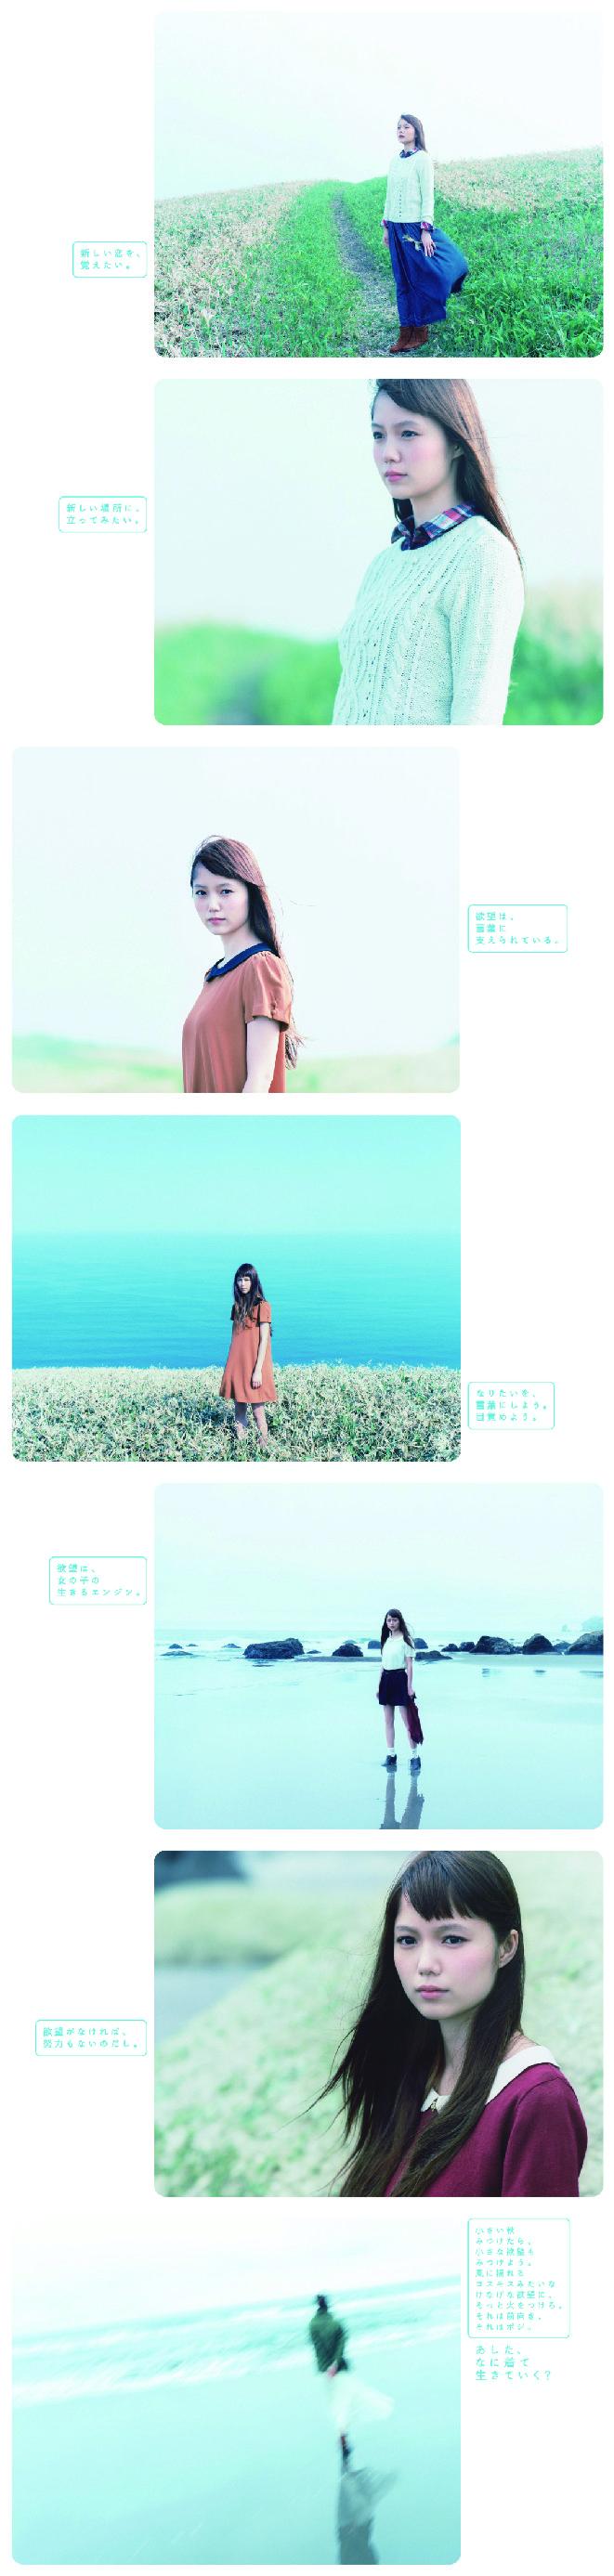 Aoi Miyazaki - earth music&ecology